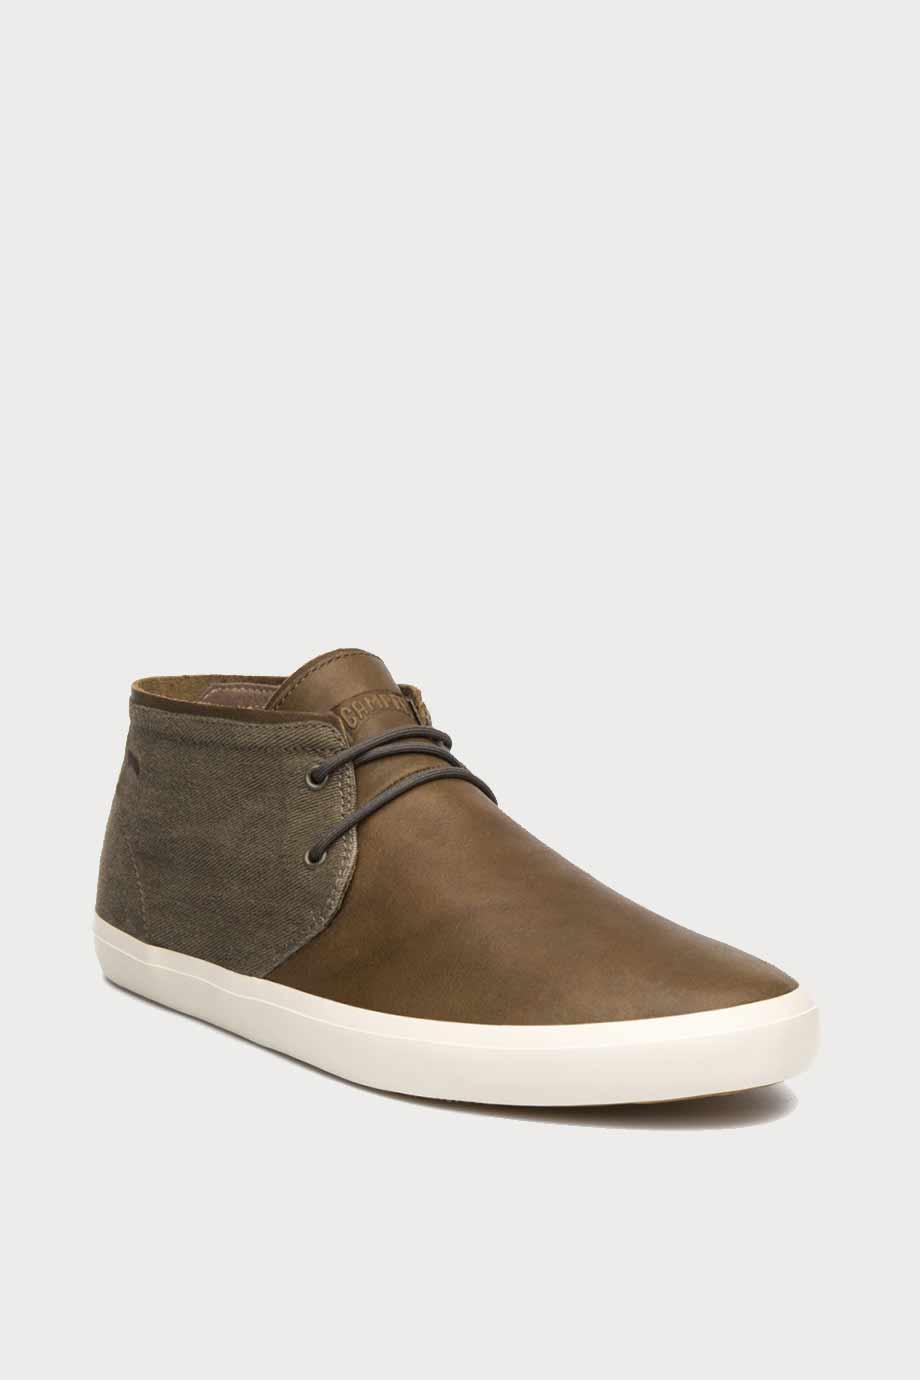 spiridoula metheniti shoes xalkida p Camper 36696 002 Motel 2